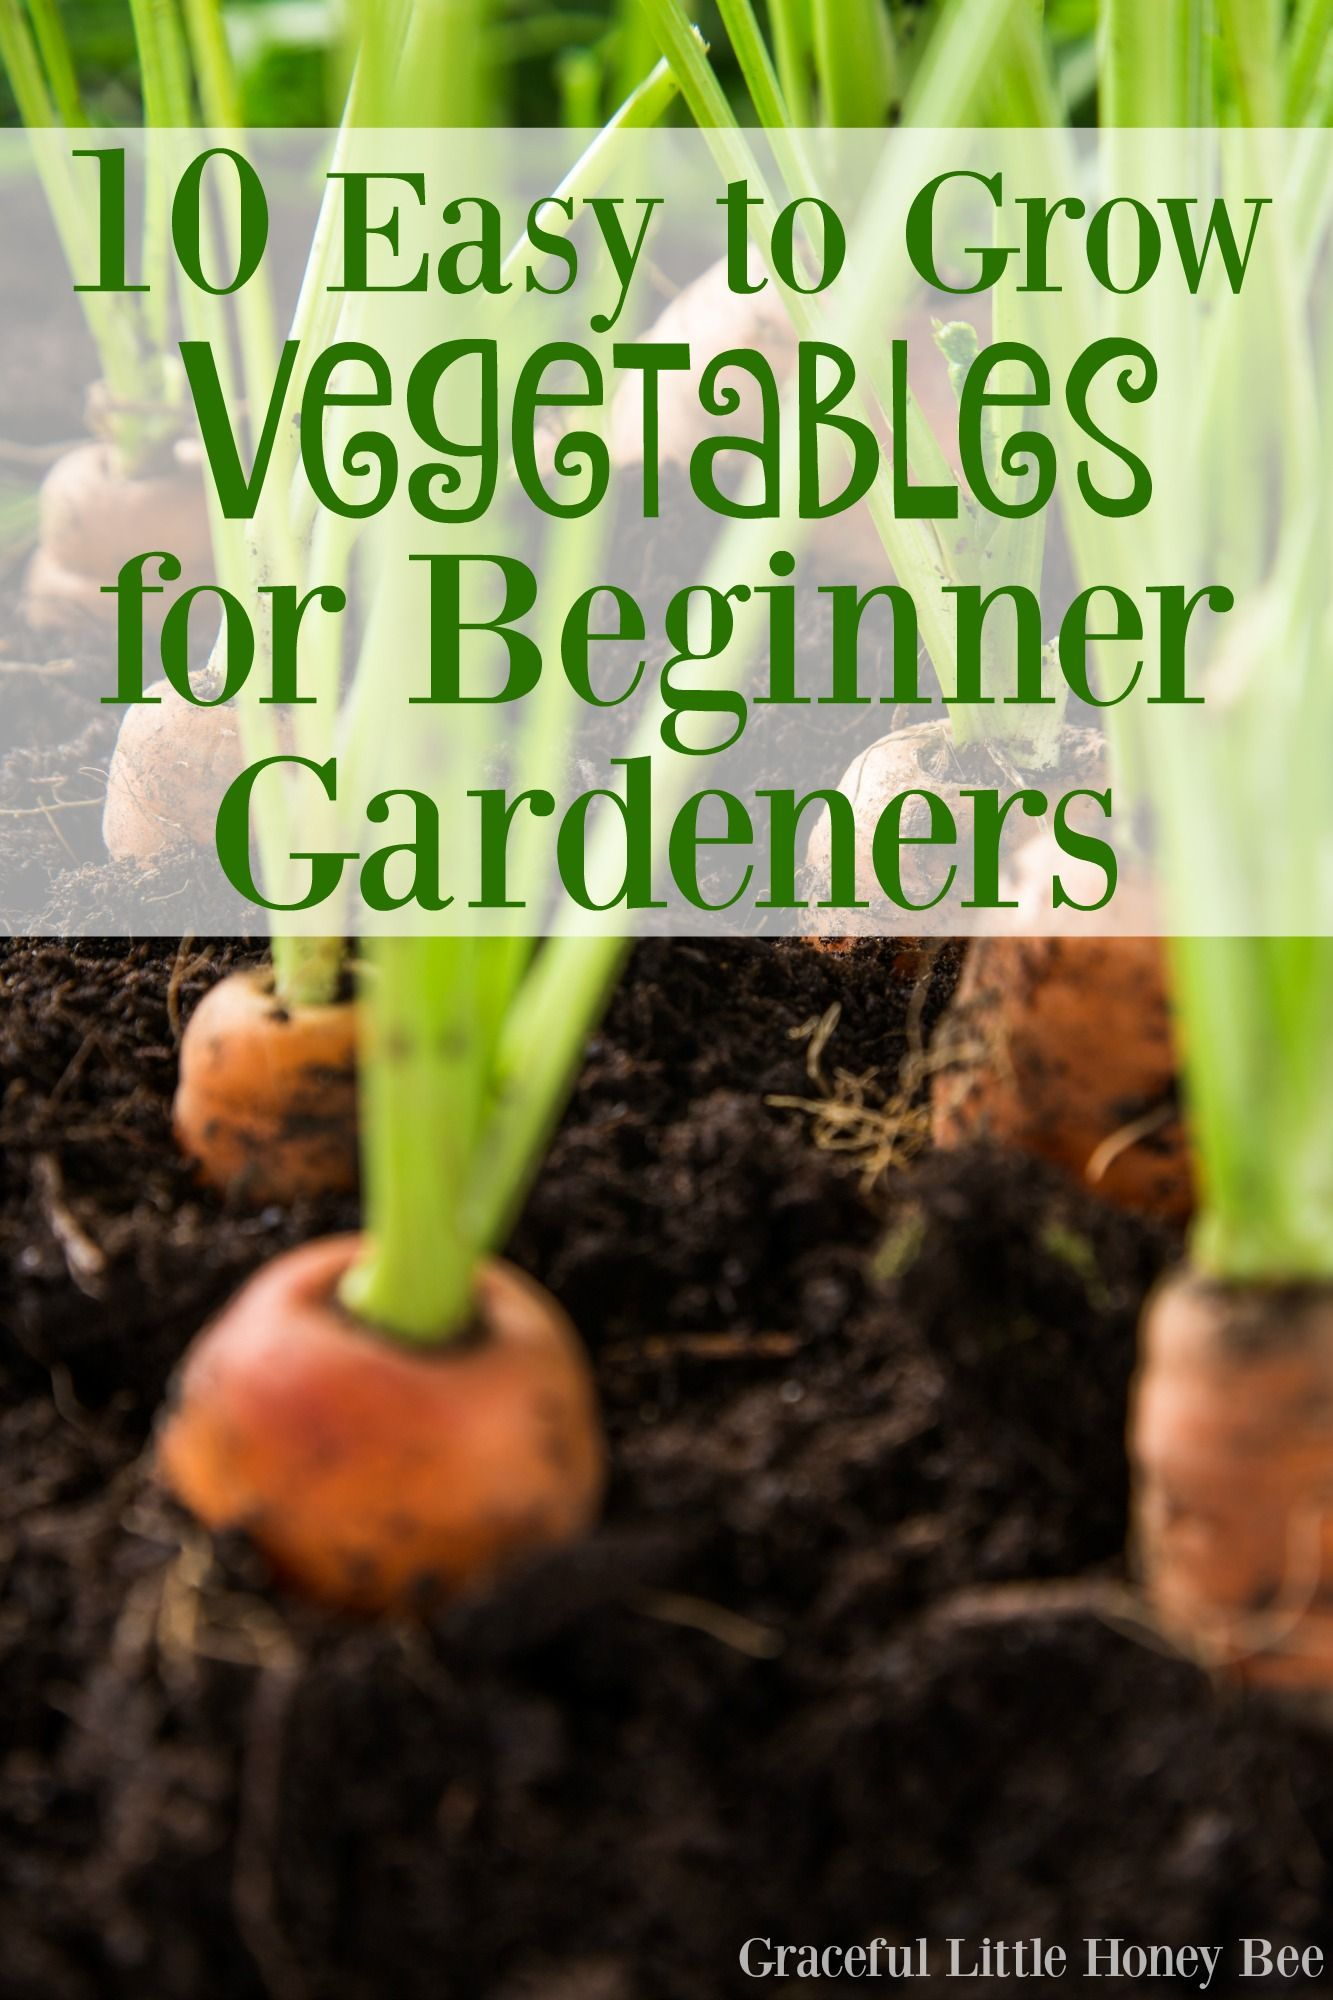 Photo of 10 Easy to Grow Vegetables for Beginner Gardeners